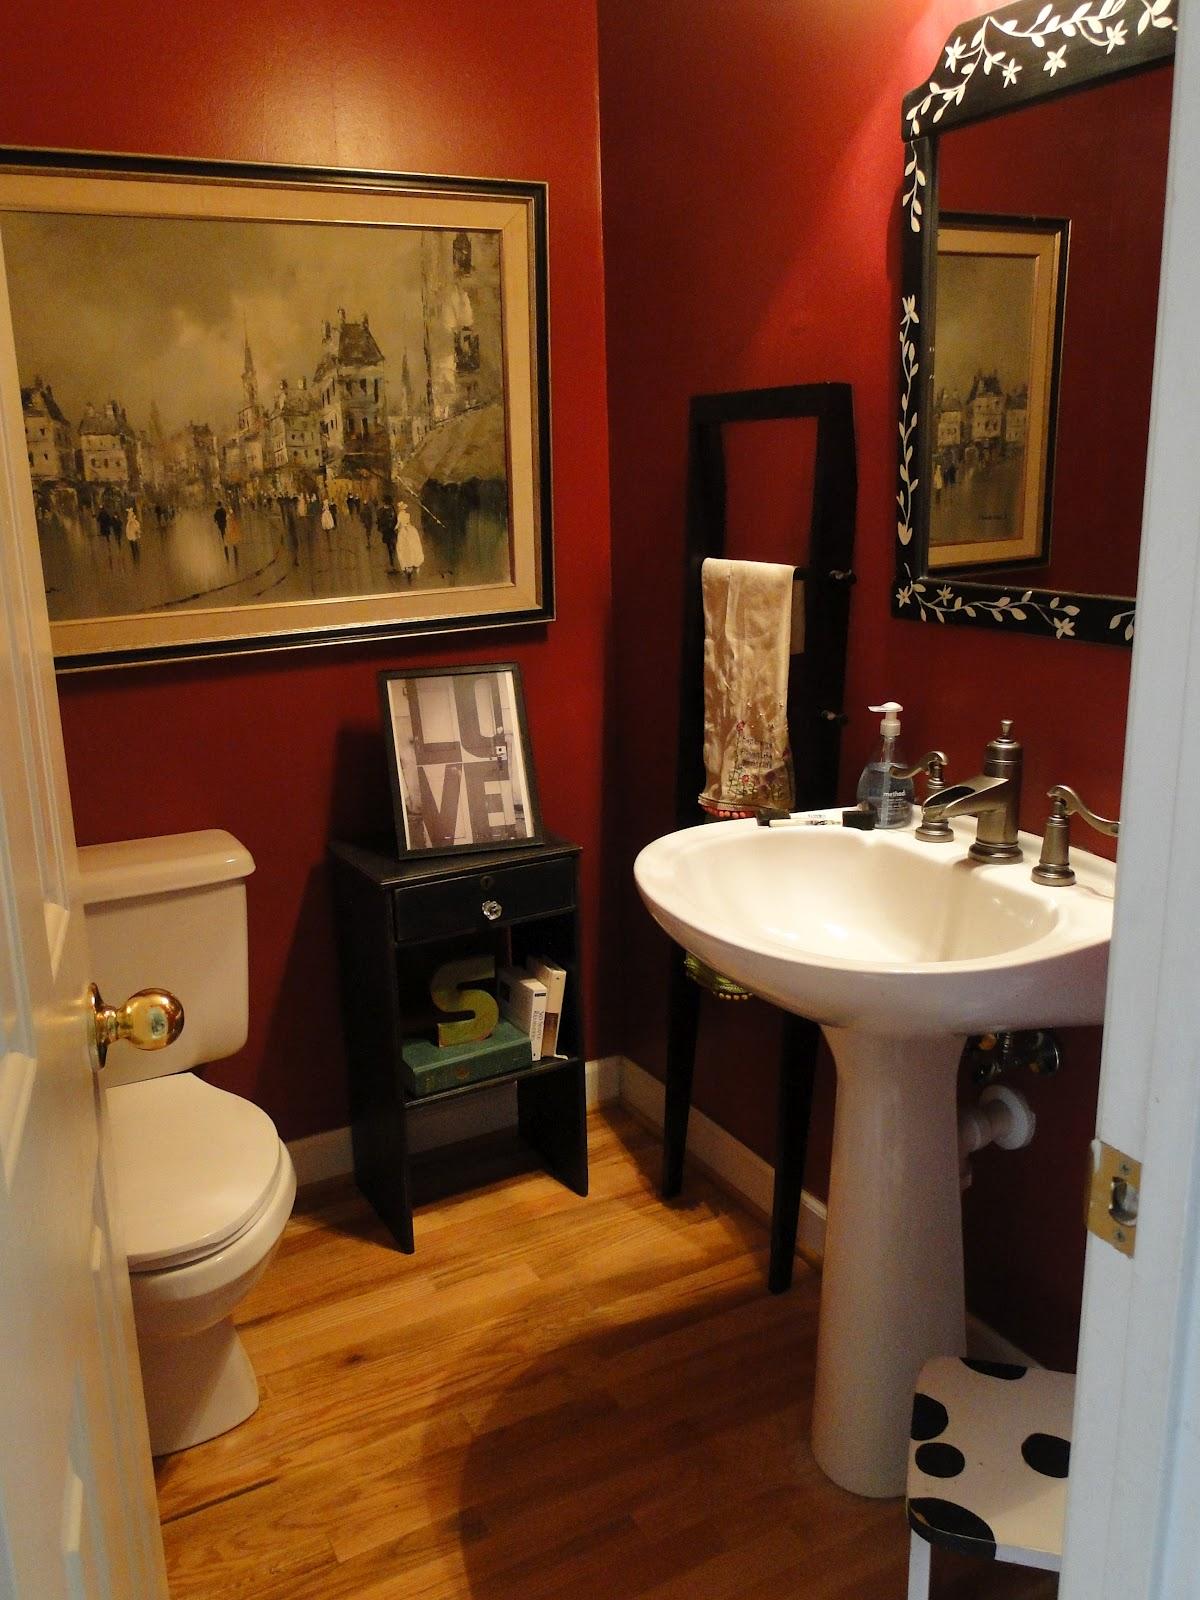 bathroom color ideas  yenihalilarcom bathroom color ideas: country bathroom colors